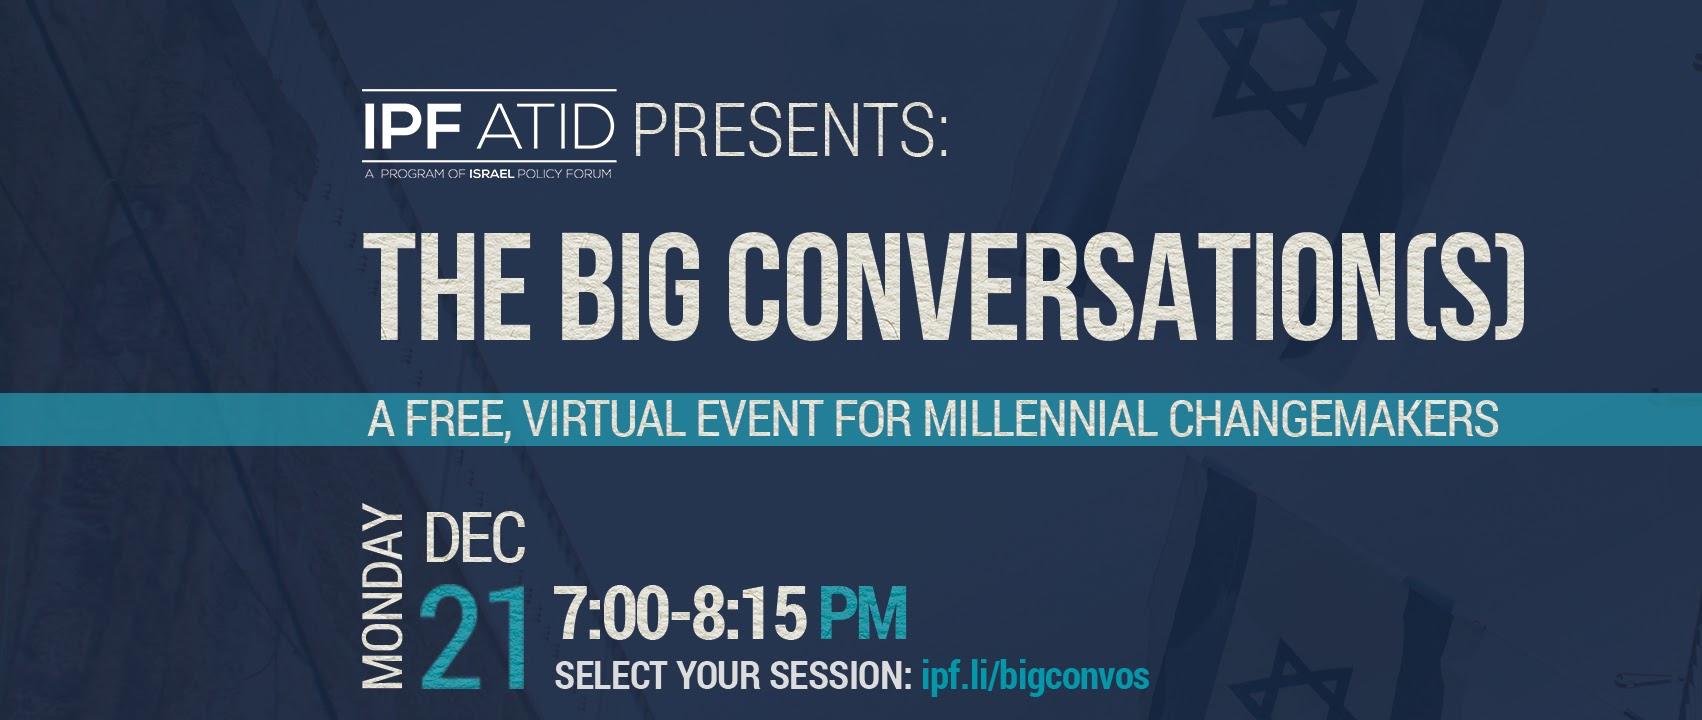 IPF Atid Presents: The Big Conversation(s) chitribe